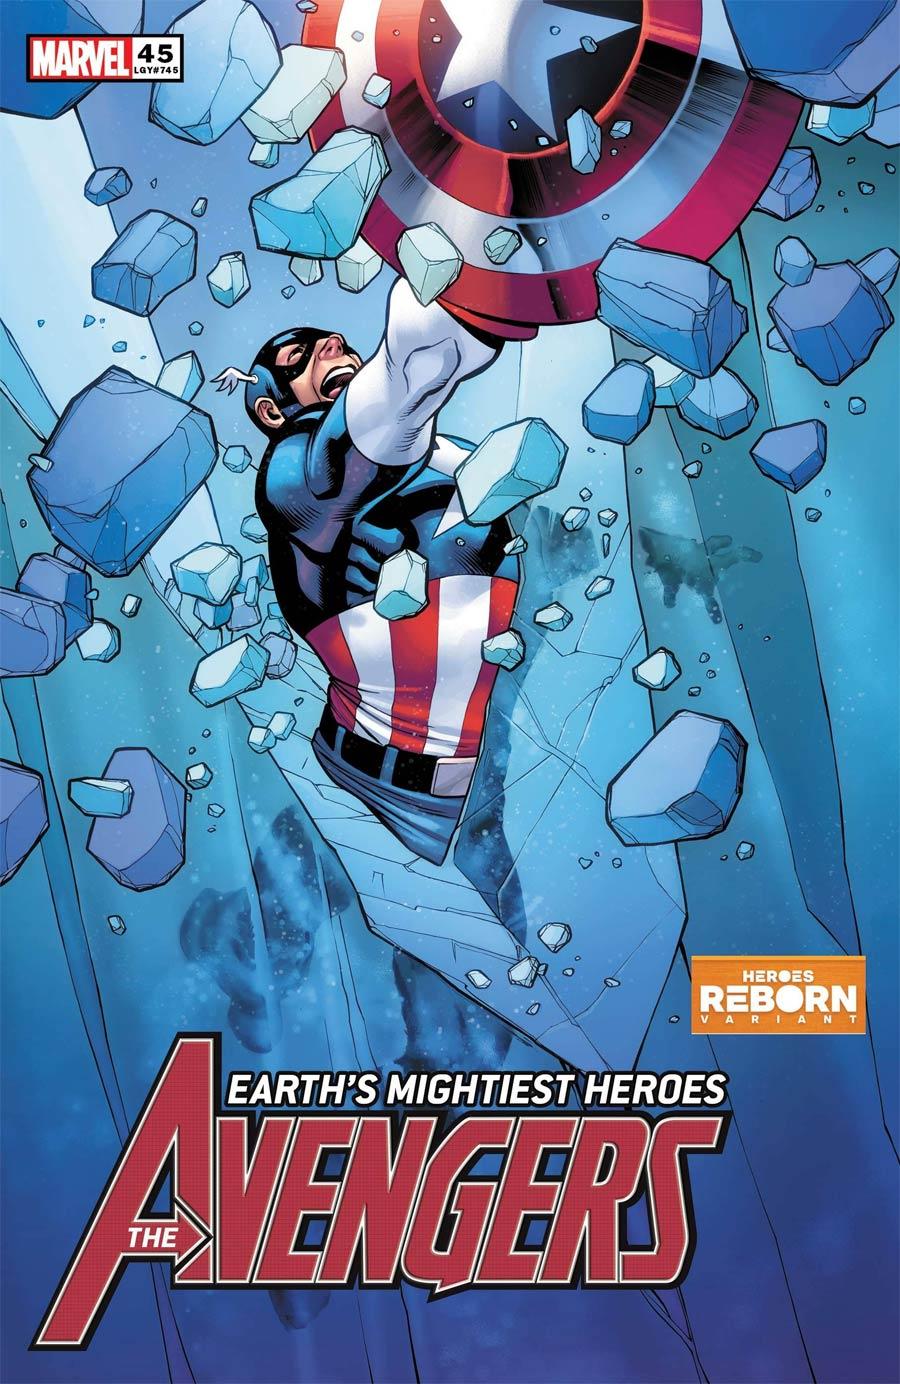 Avengers Vol 7 #45 Cover B Variant Carlos Pacheco Heroes Reborn Cover (King In Black Tie-In)